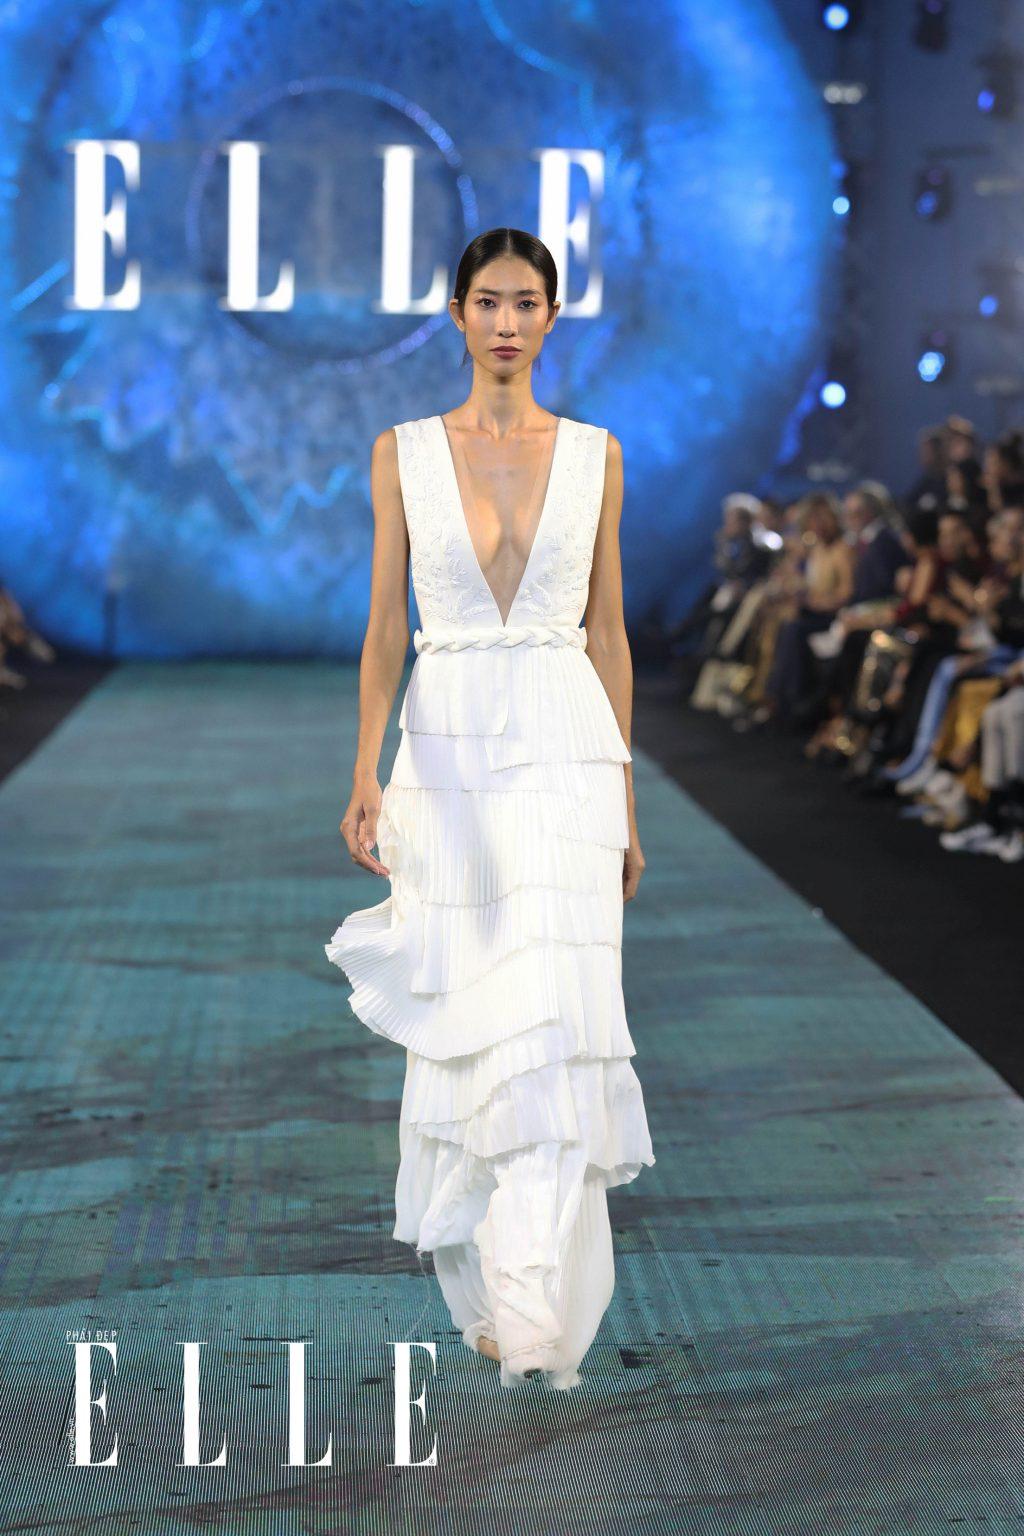 xu huong trang diem thong linh san dien elle fashion journey 2018 03